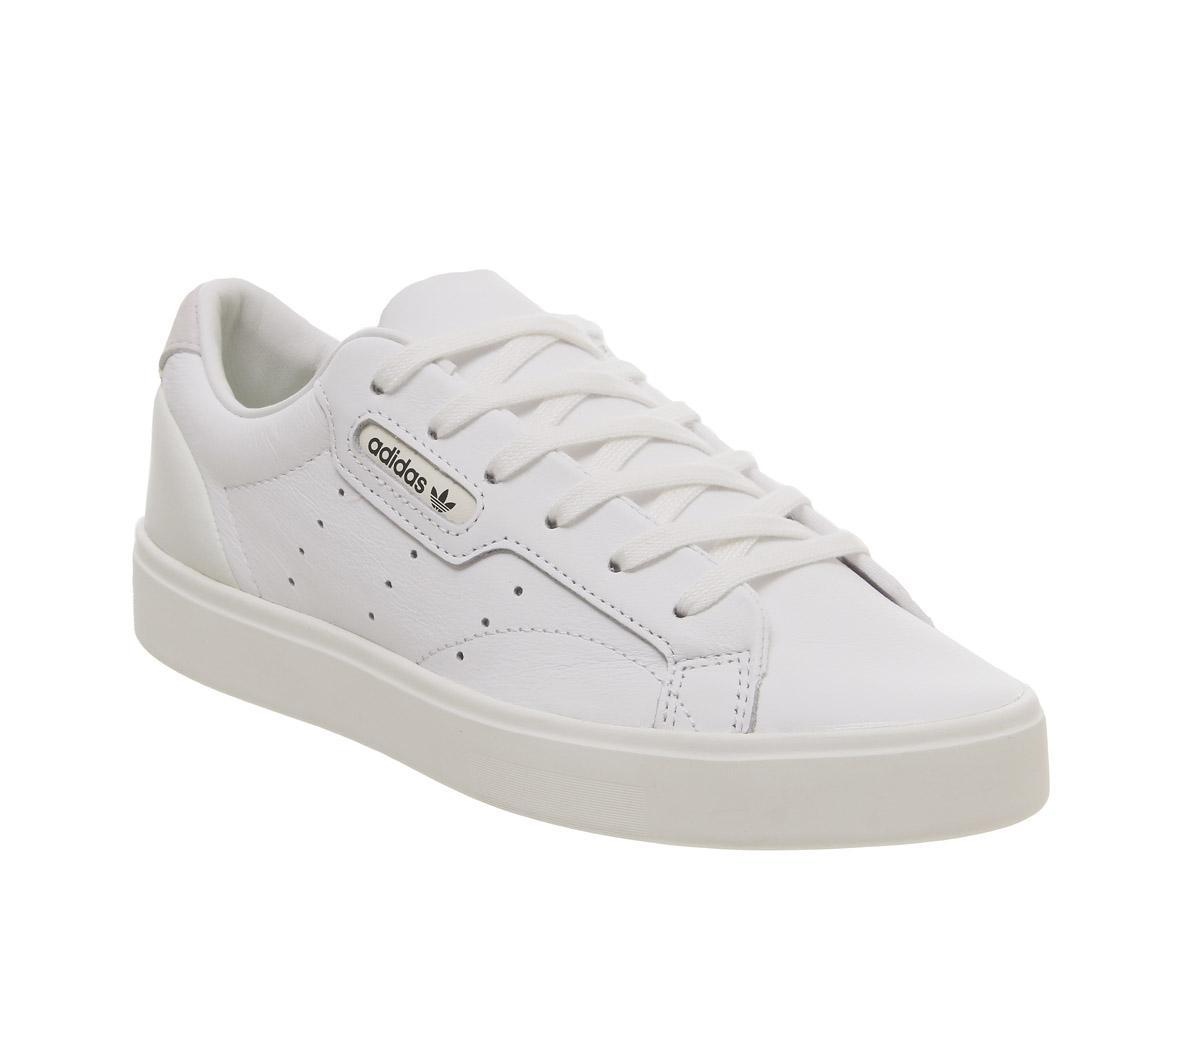 adidas Sleek Trainers White Off White